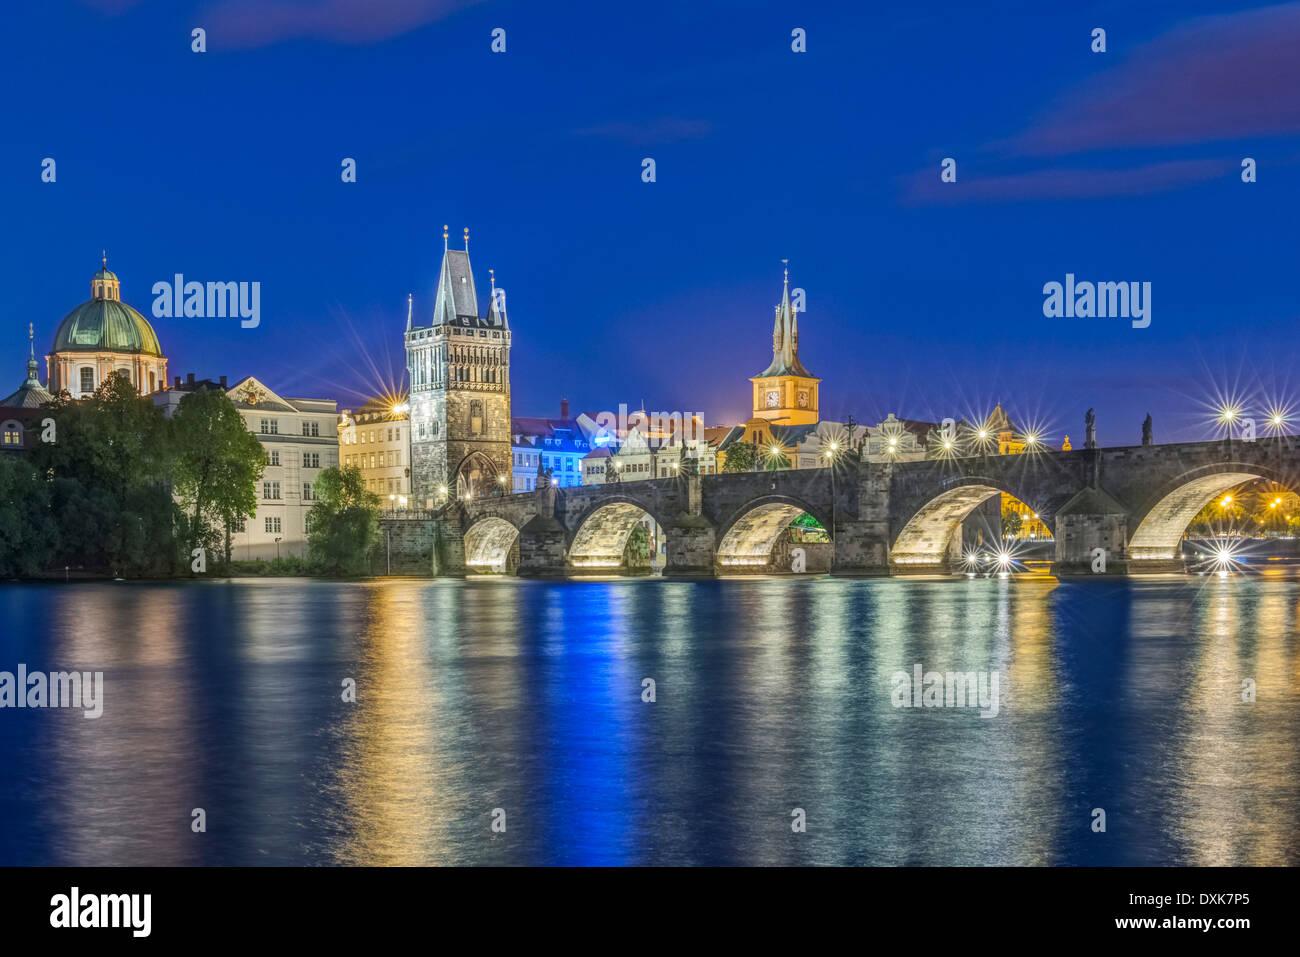 Charles Bridge and city illuminated at night, Prague, Czech Republic - Stock Image